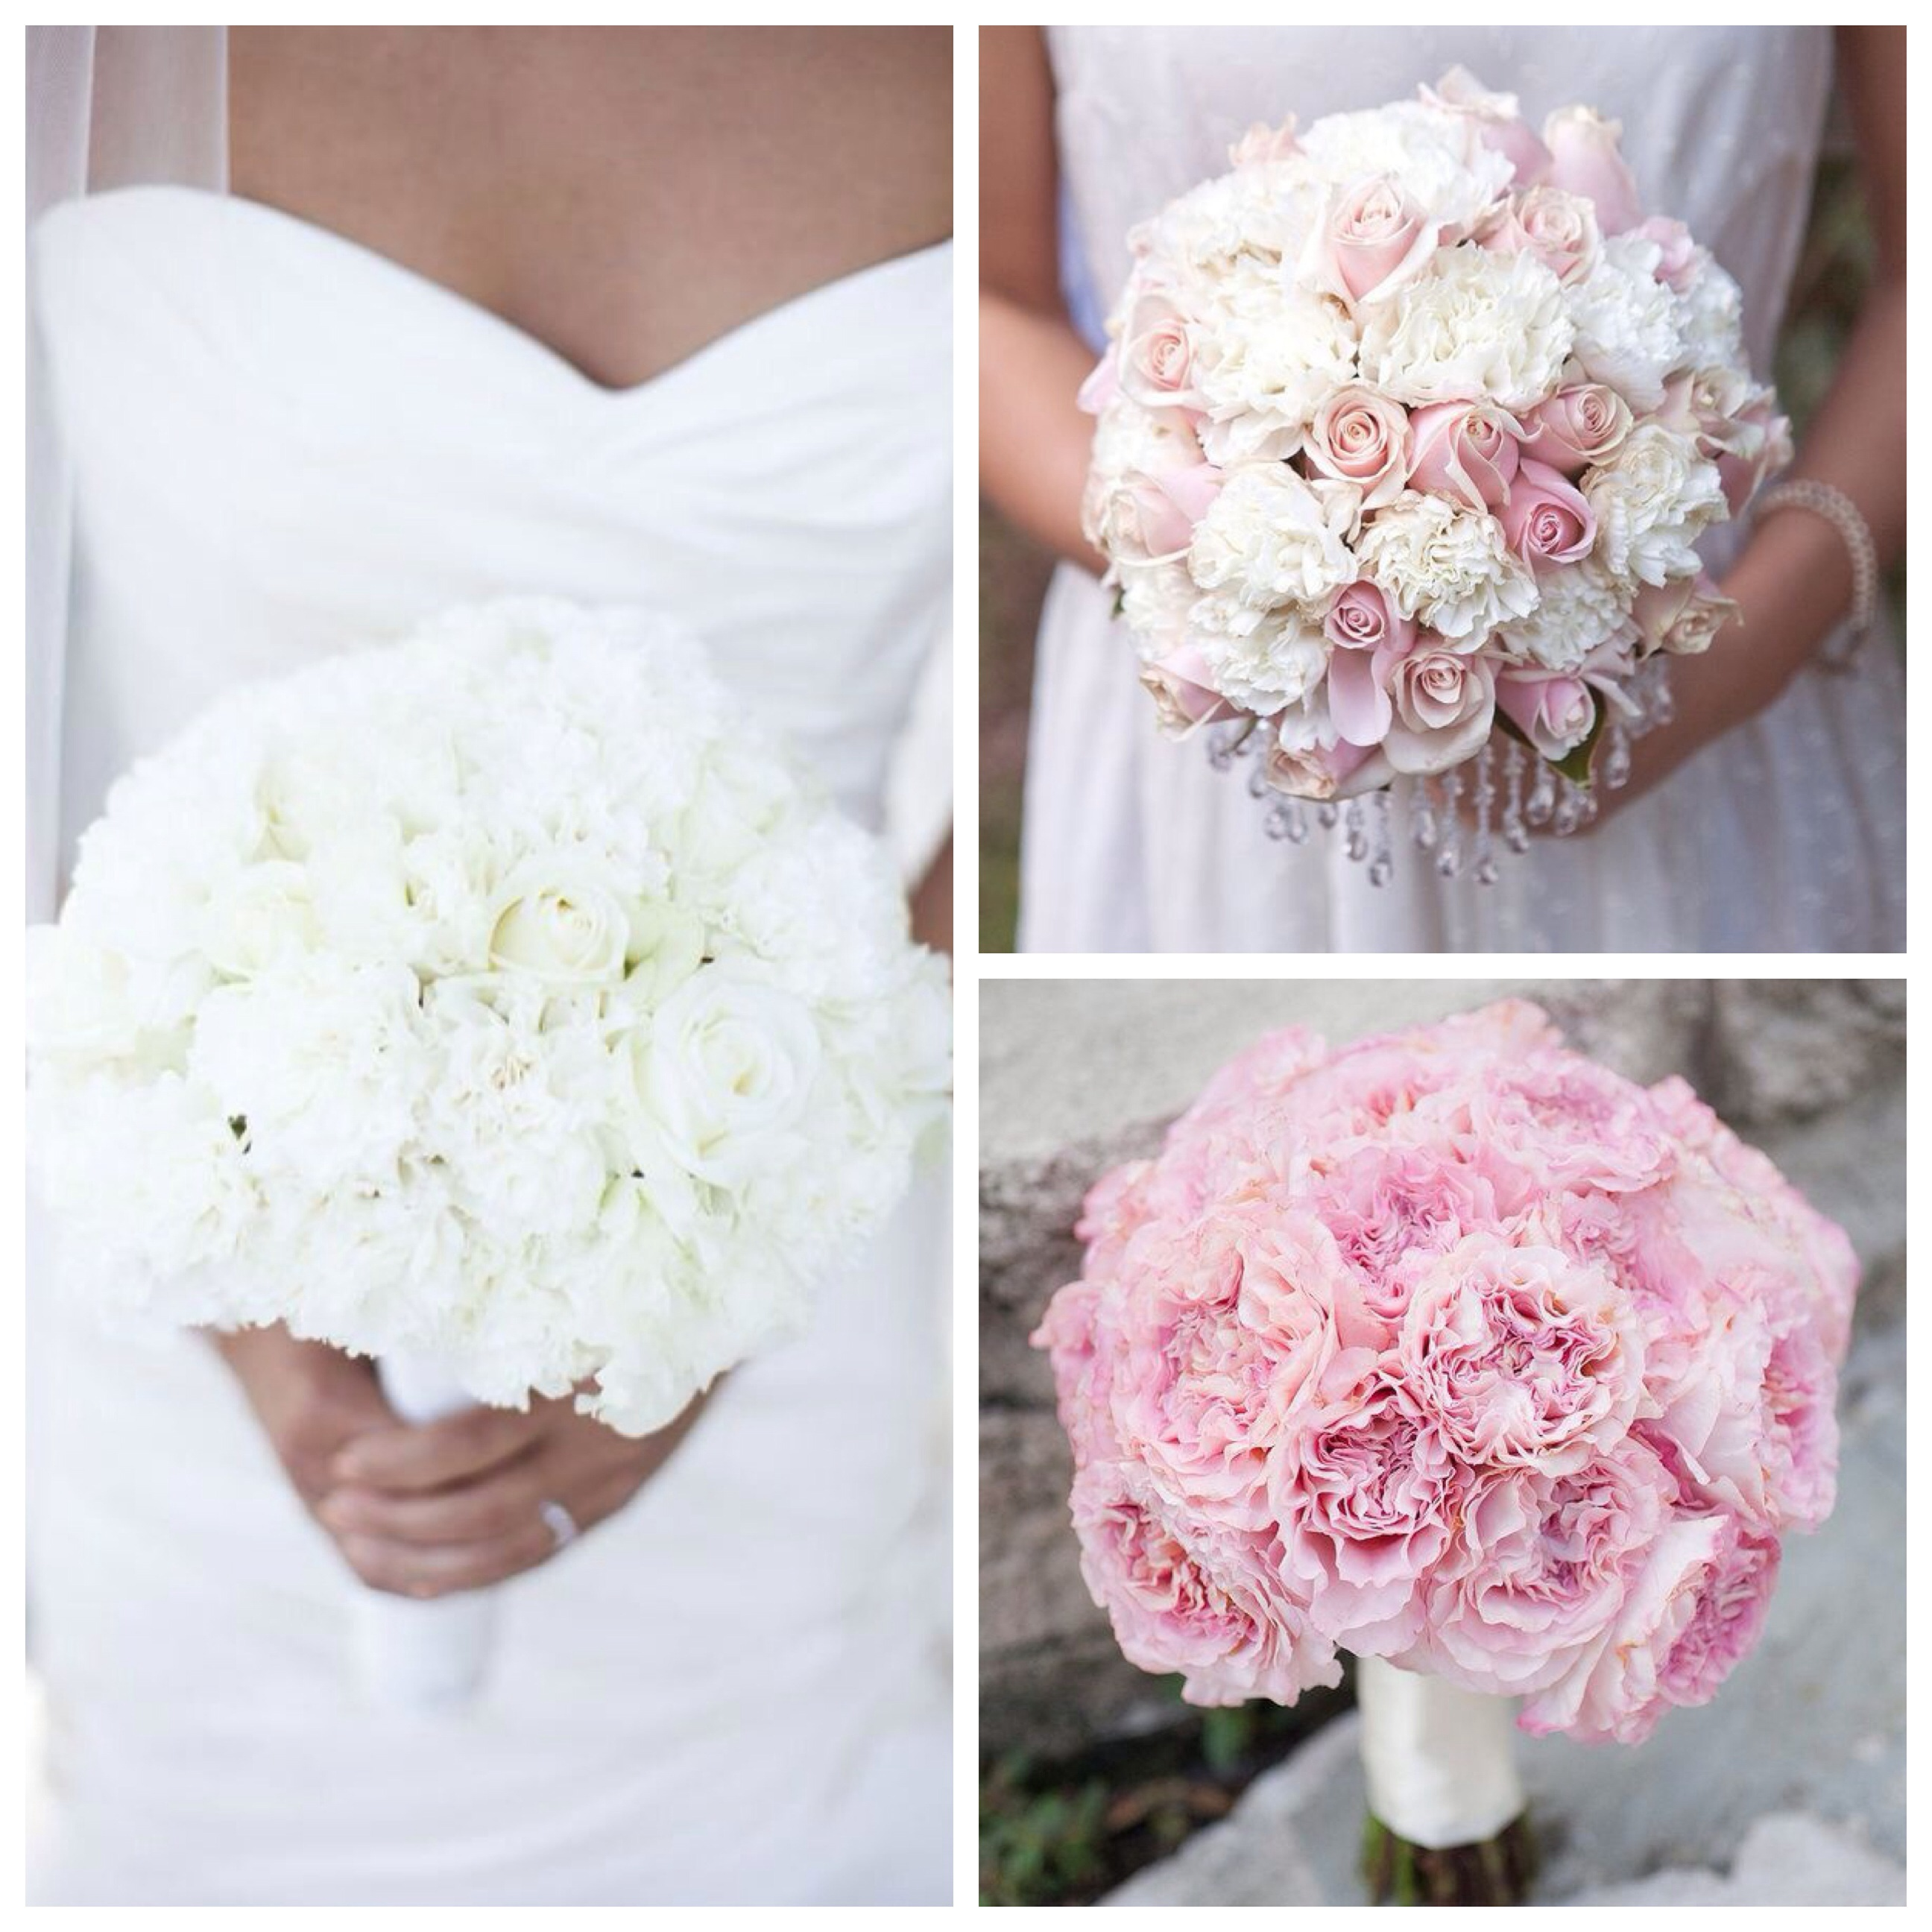 Carnation Flower Wedding Bouquet Gallery - Flower Wallpaper HD